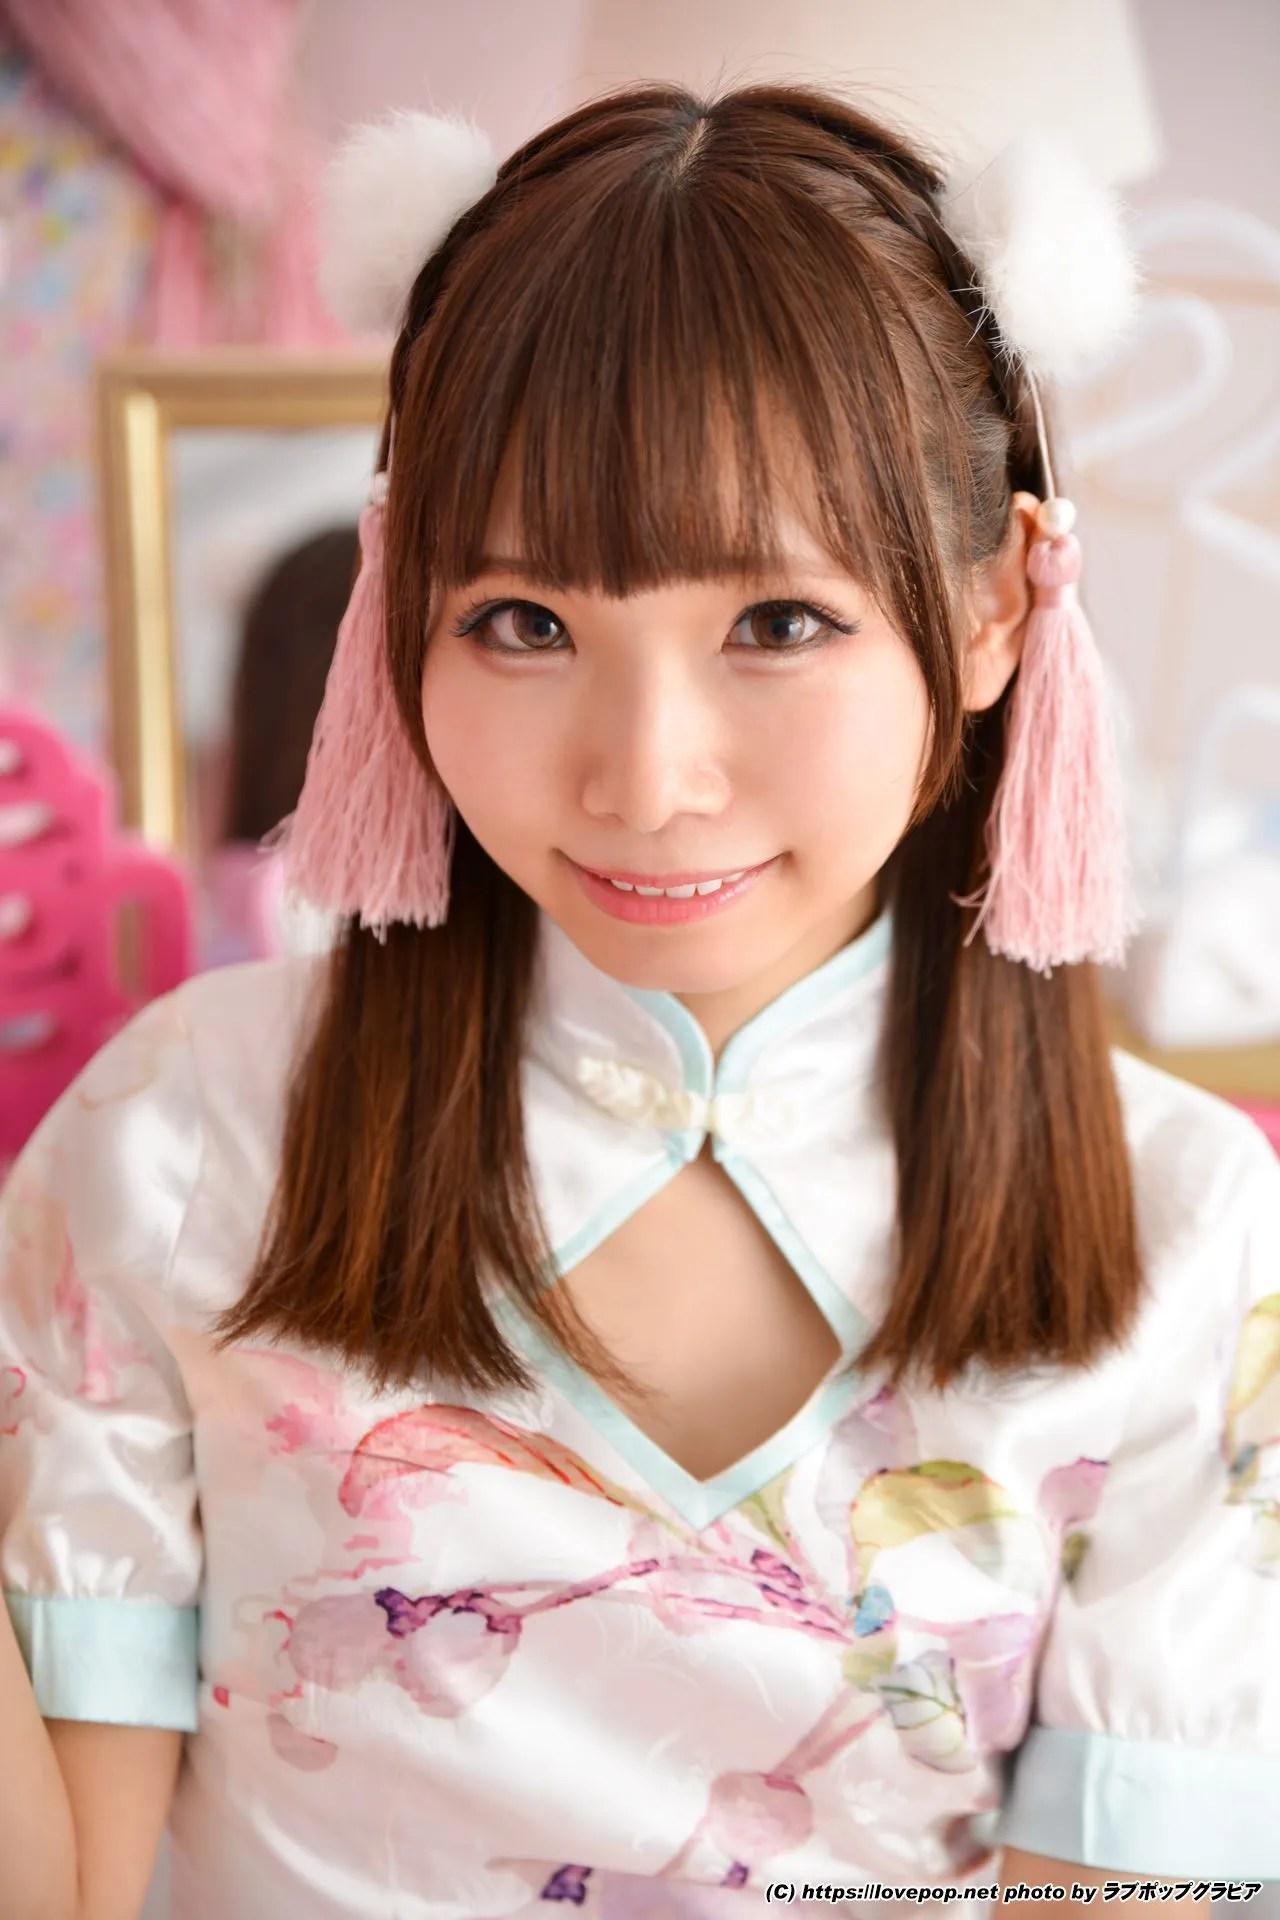 [LOVEPOP] 姫宫まほれ Mahore Himemiya Photoset 04 写真集[70P]插图(6)